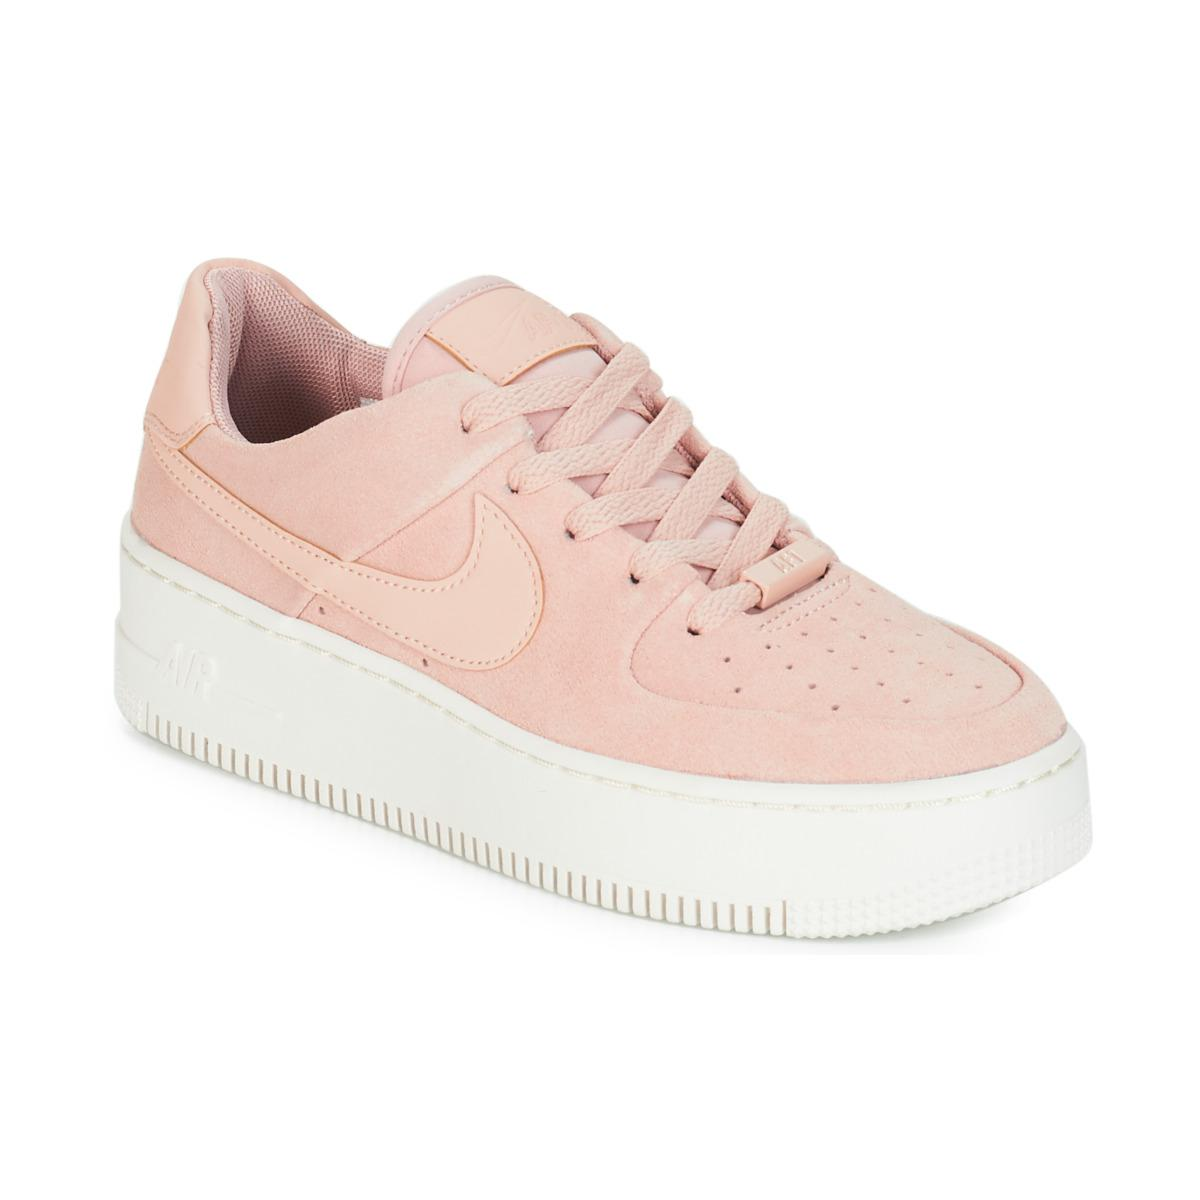 Air Femmes Low Force Sage 1 En W Rose Chaussures 4jAL5R